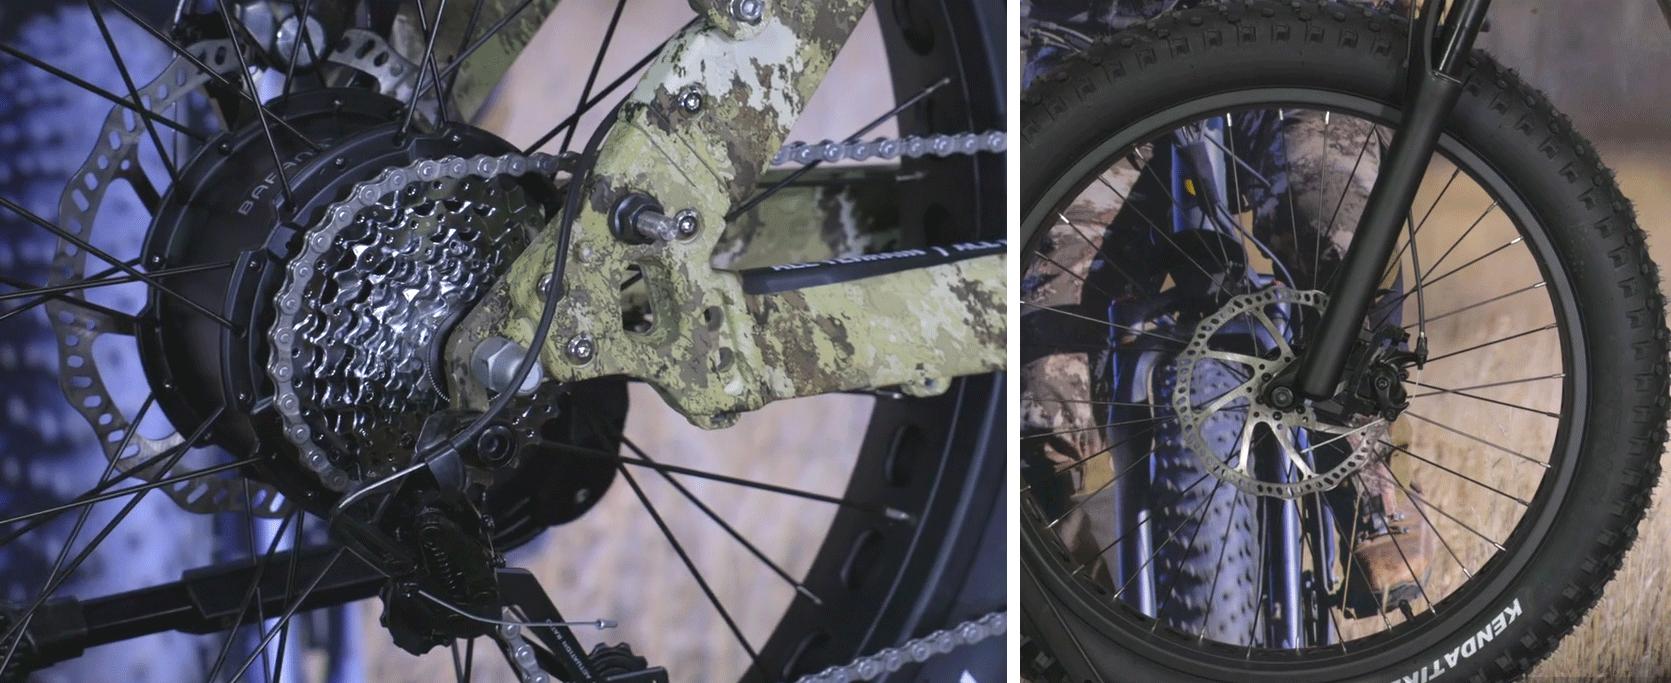 7-speed SRAM drivetrain and mechanical Tektro disc brakes on QuietKat Ranger